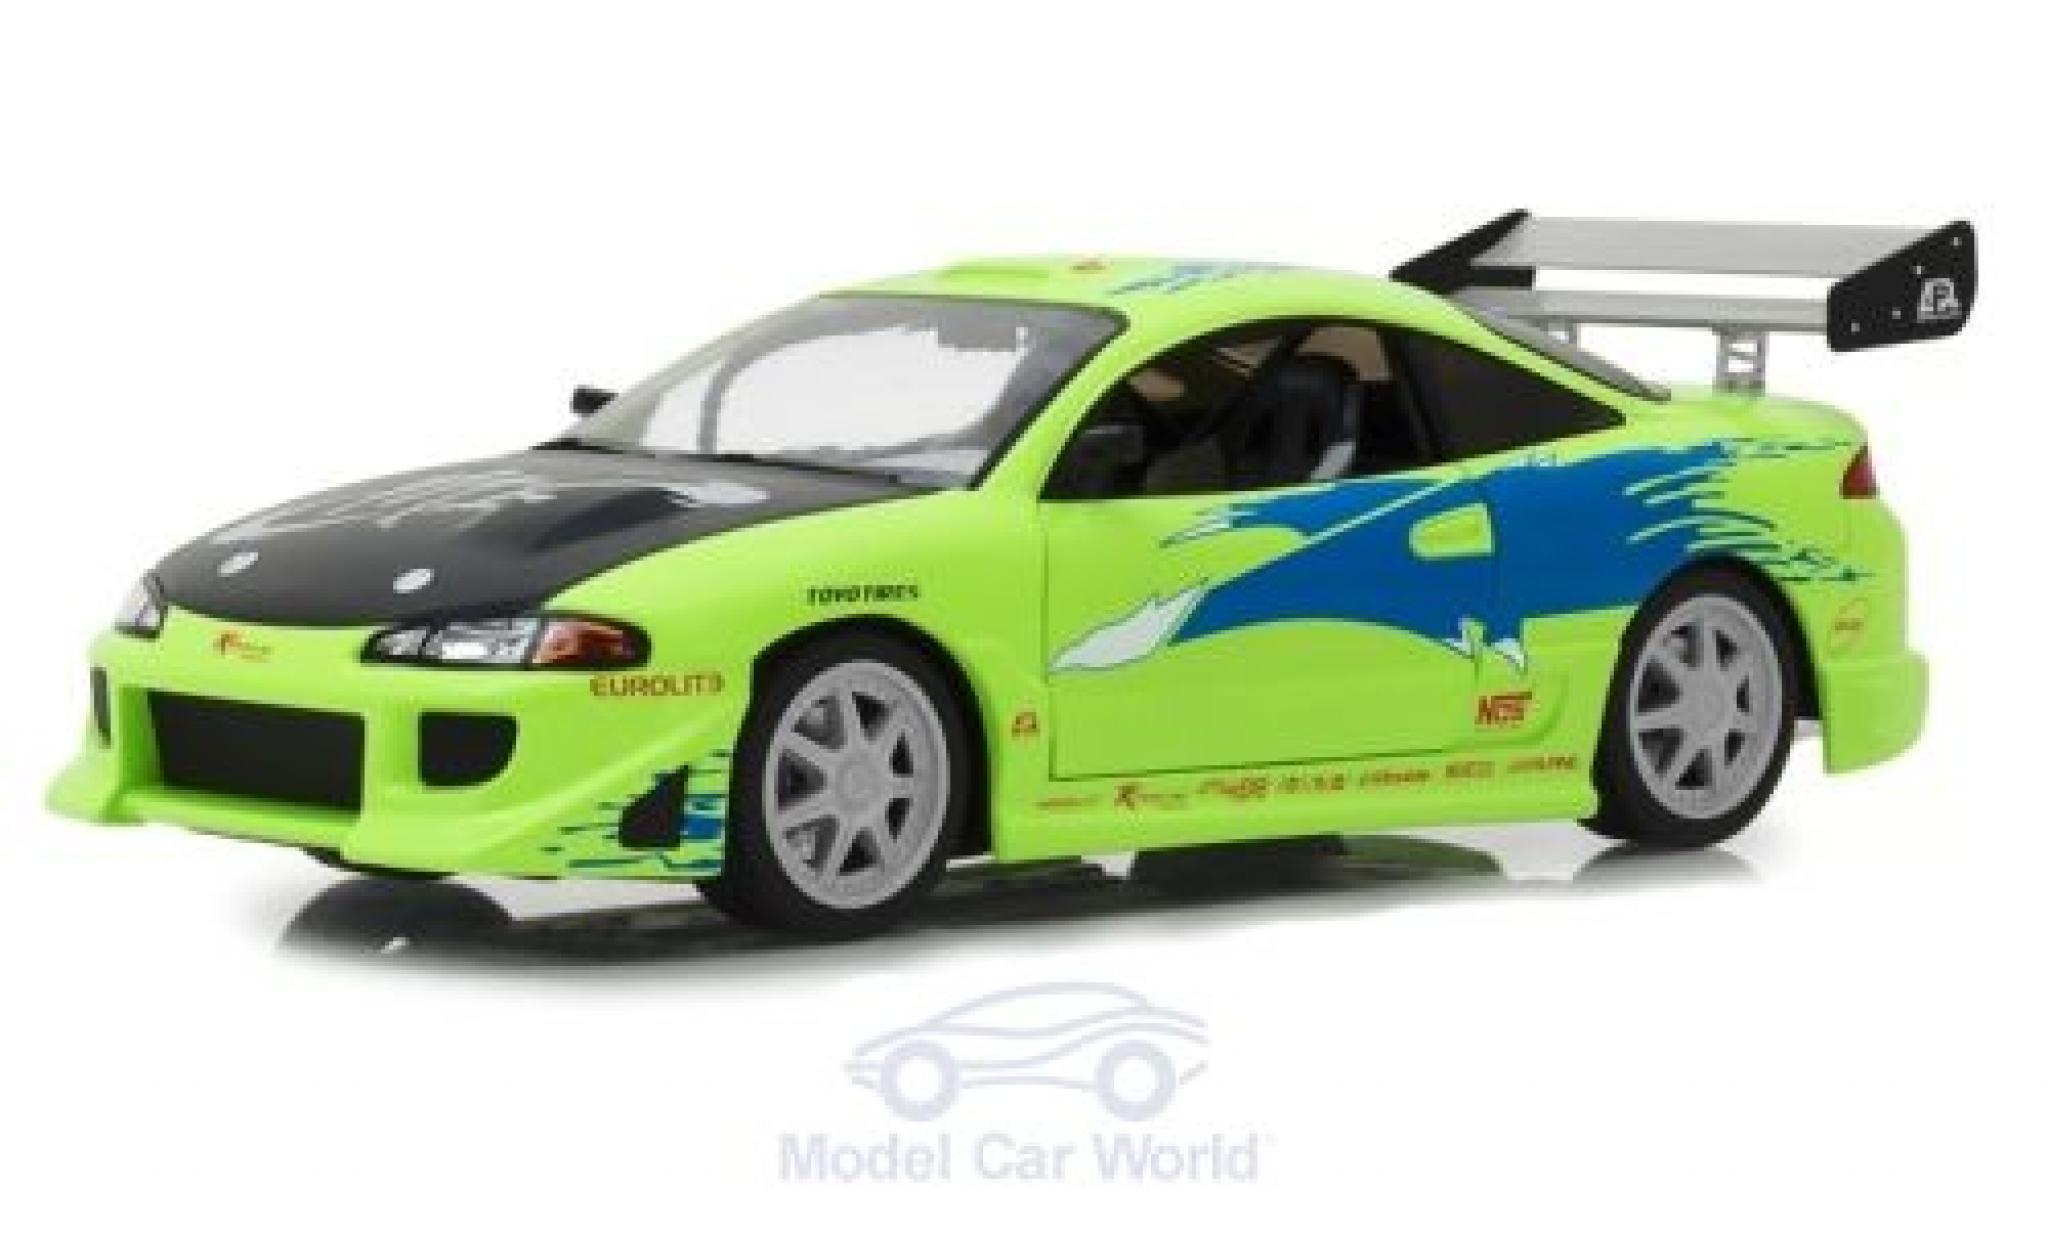 Mitsubishi Eclipse 1/18 Greenlight green/Dekor Fast & Furious 1995